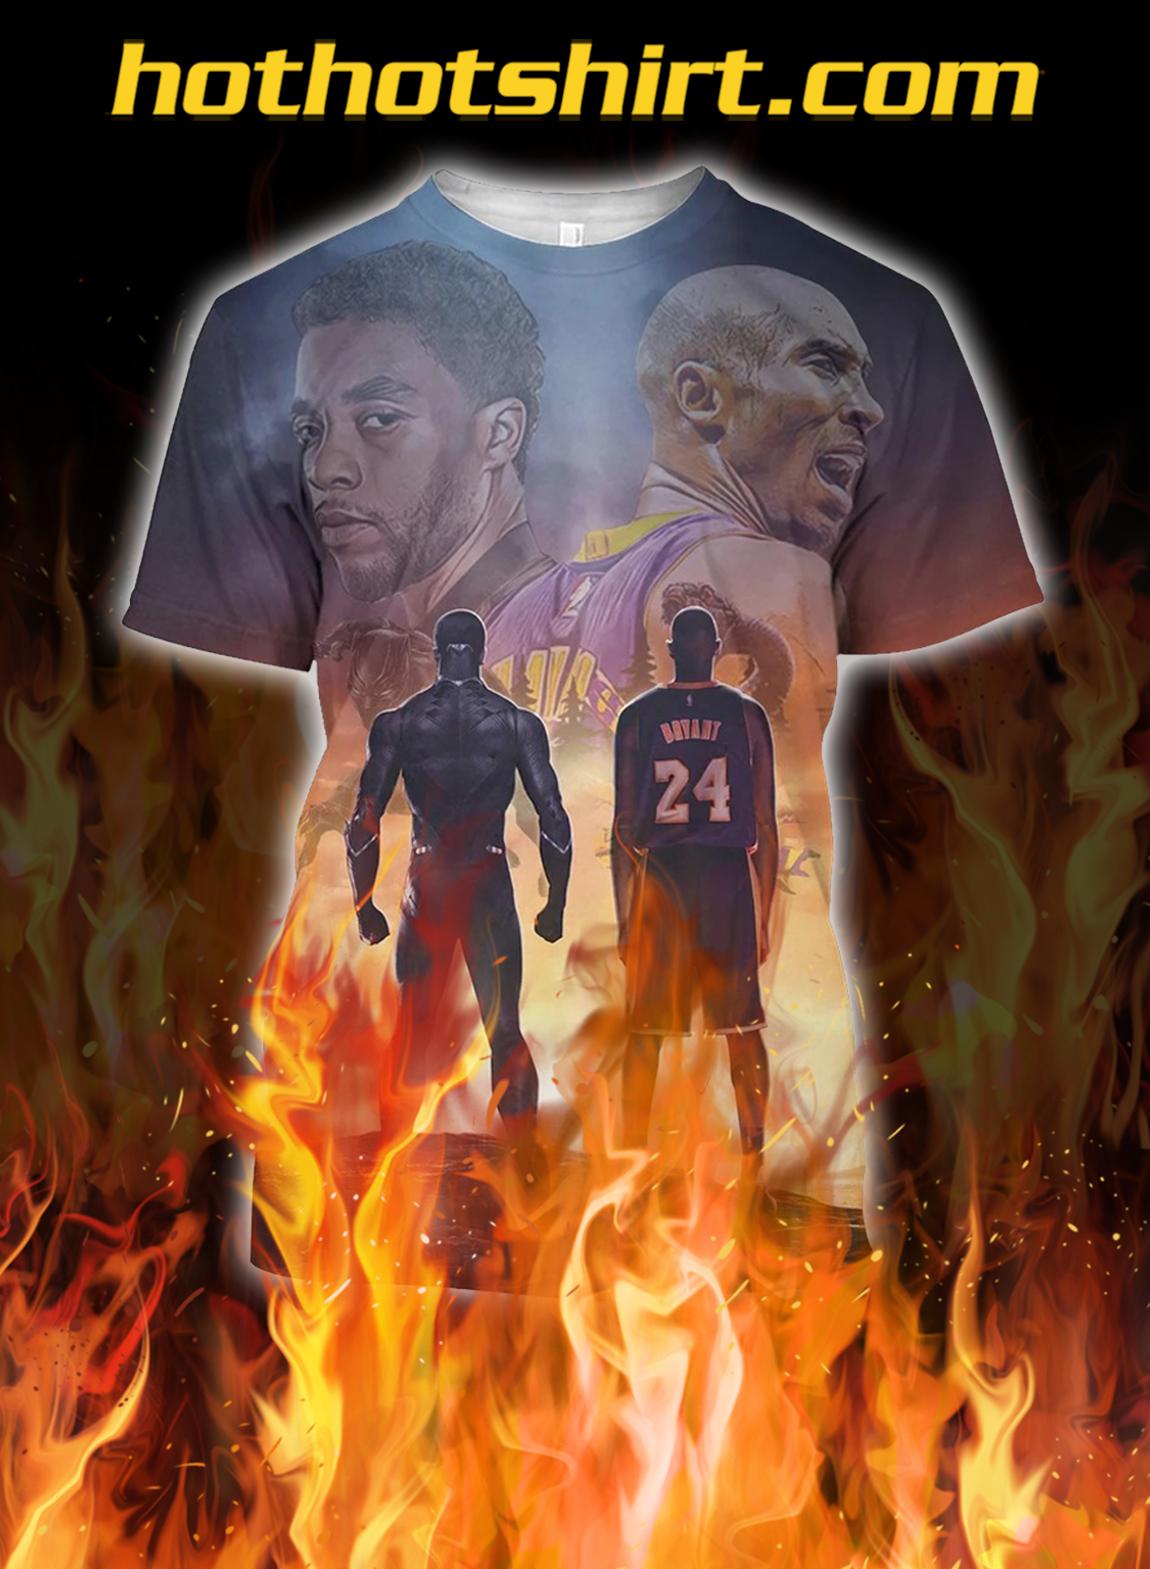 Kobe bryant and chadwick boseman 3d fullprint shirt